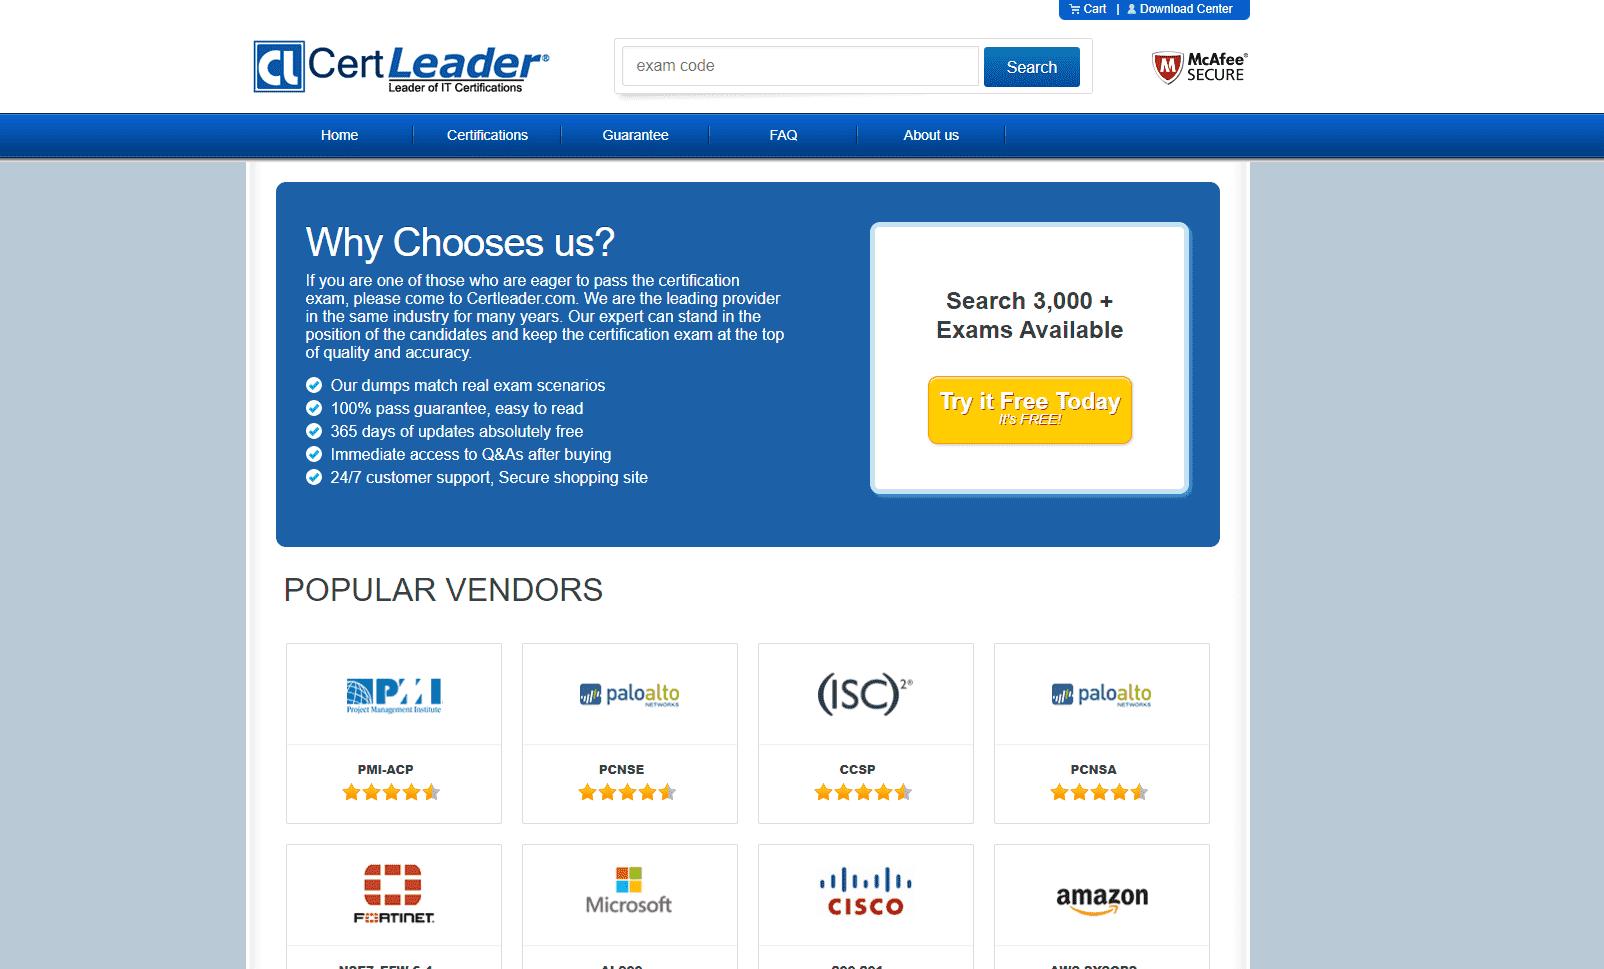 Certleader reviews and complaints